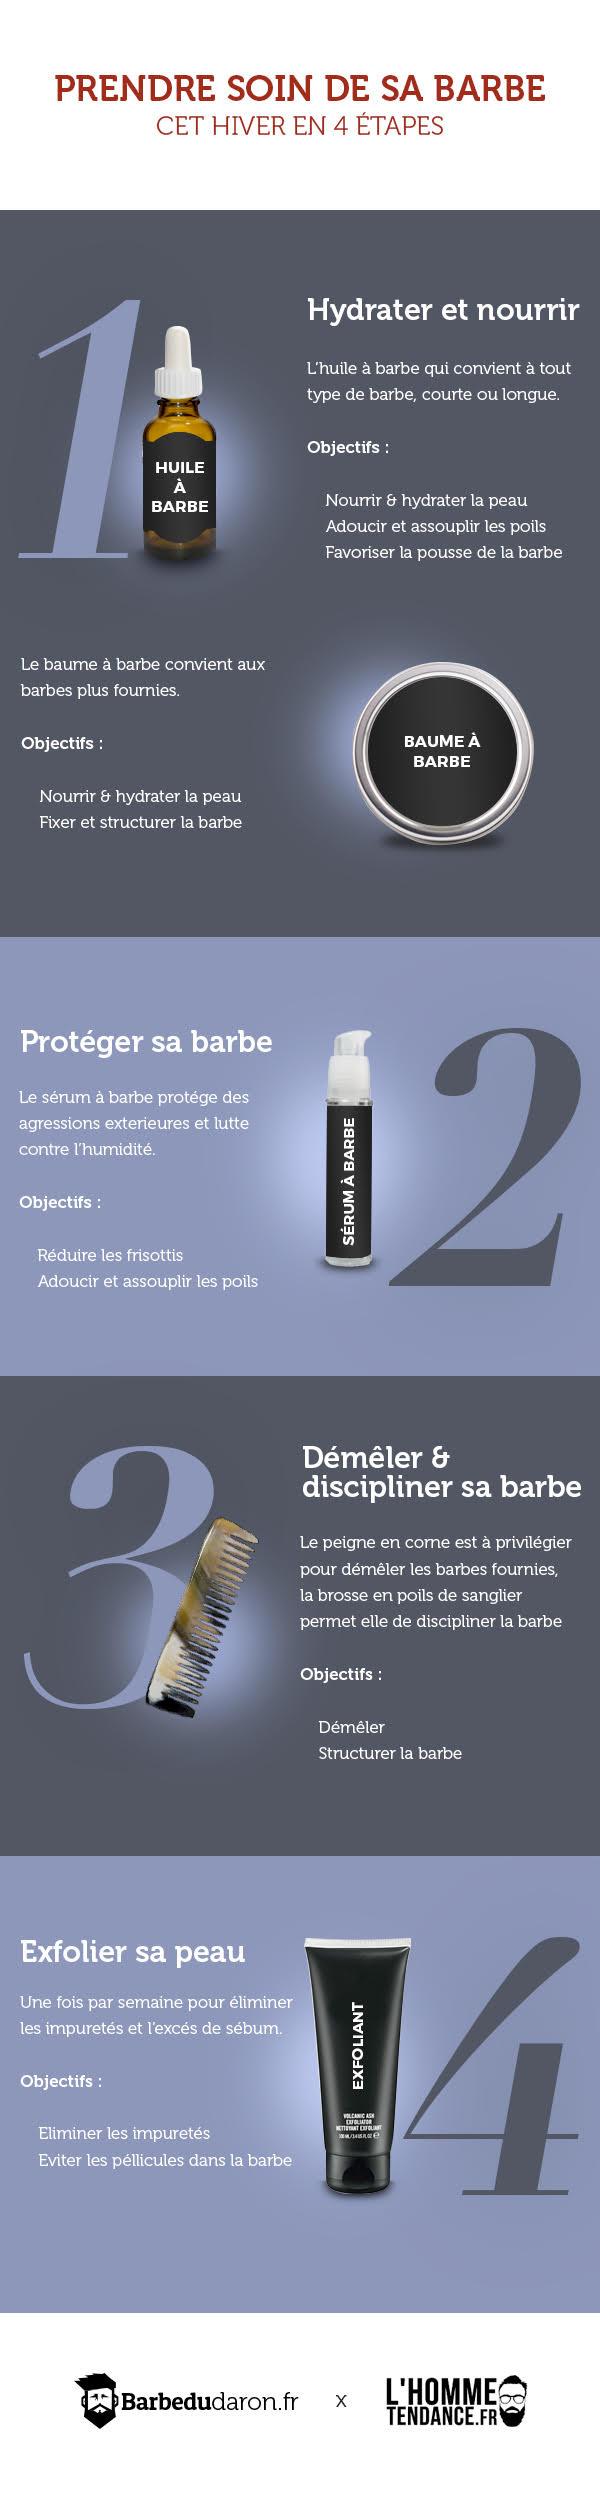 Prendre soin de sa barbe en 4 étapes (Infographie)